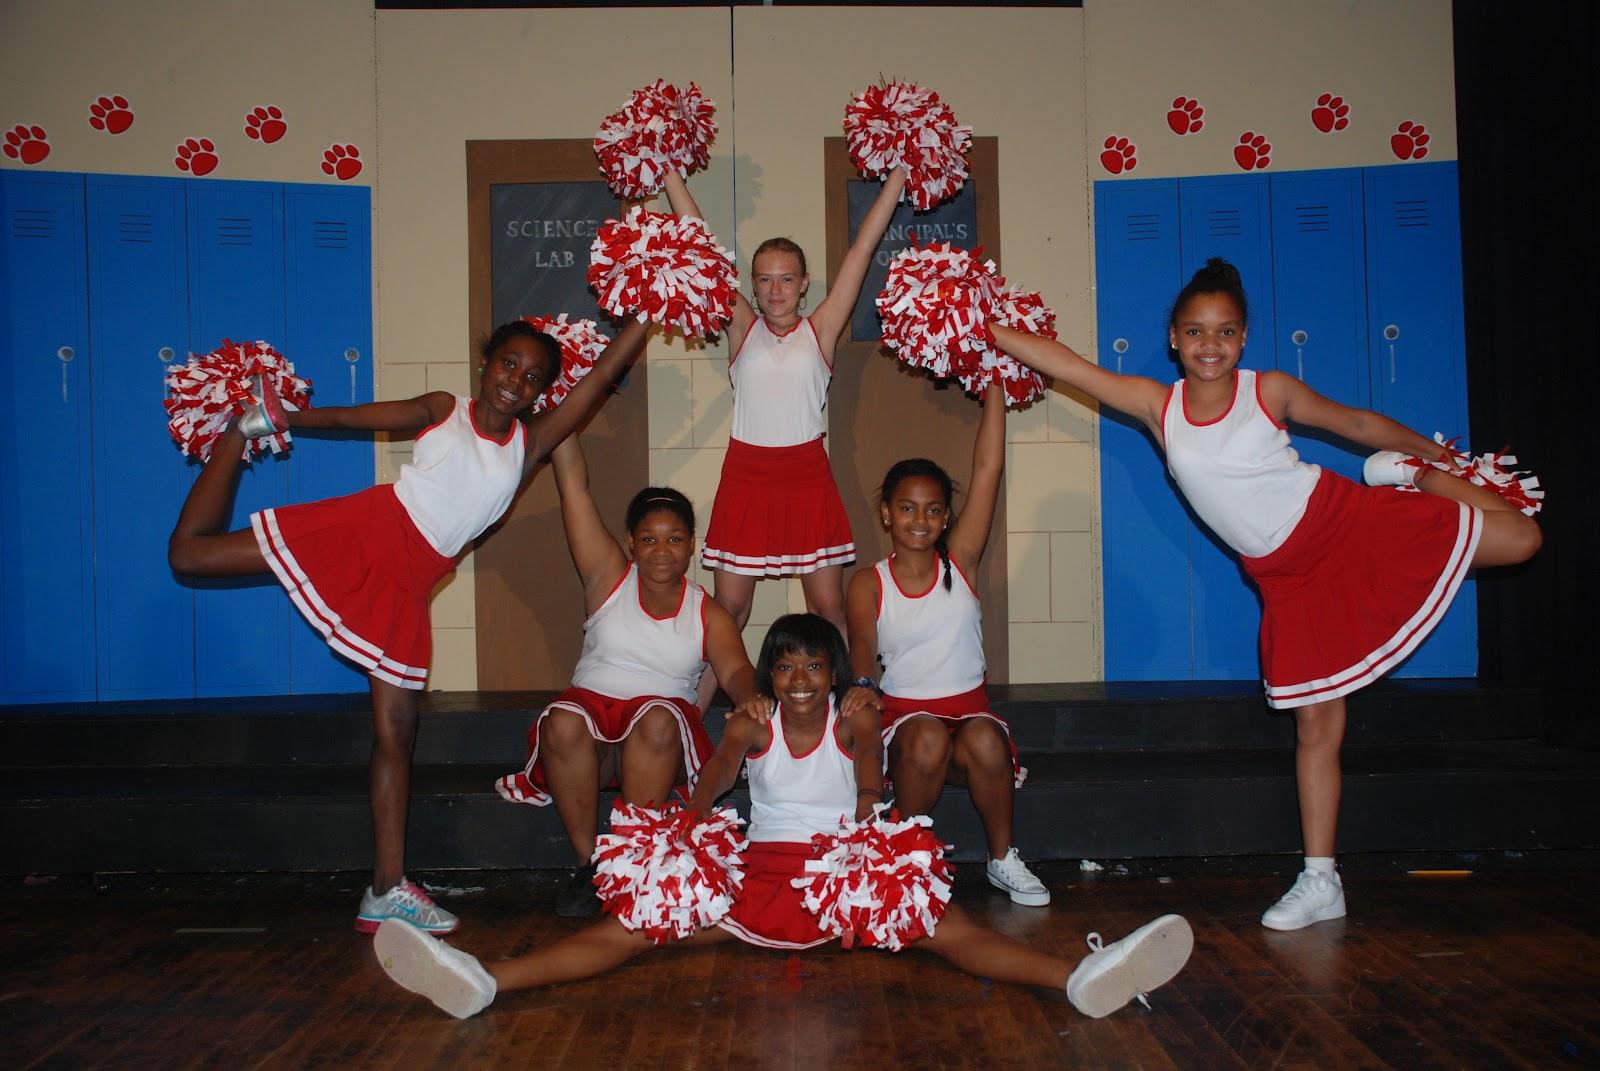 Night lights james dobson - Cheerleaders